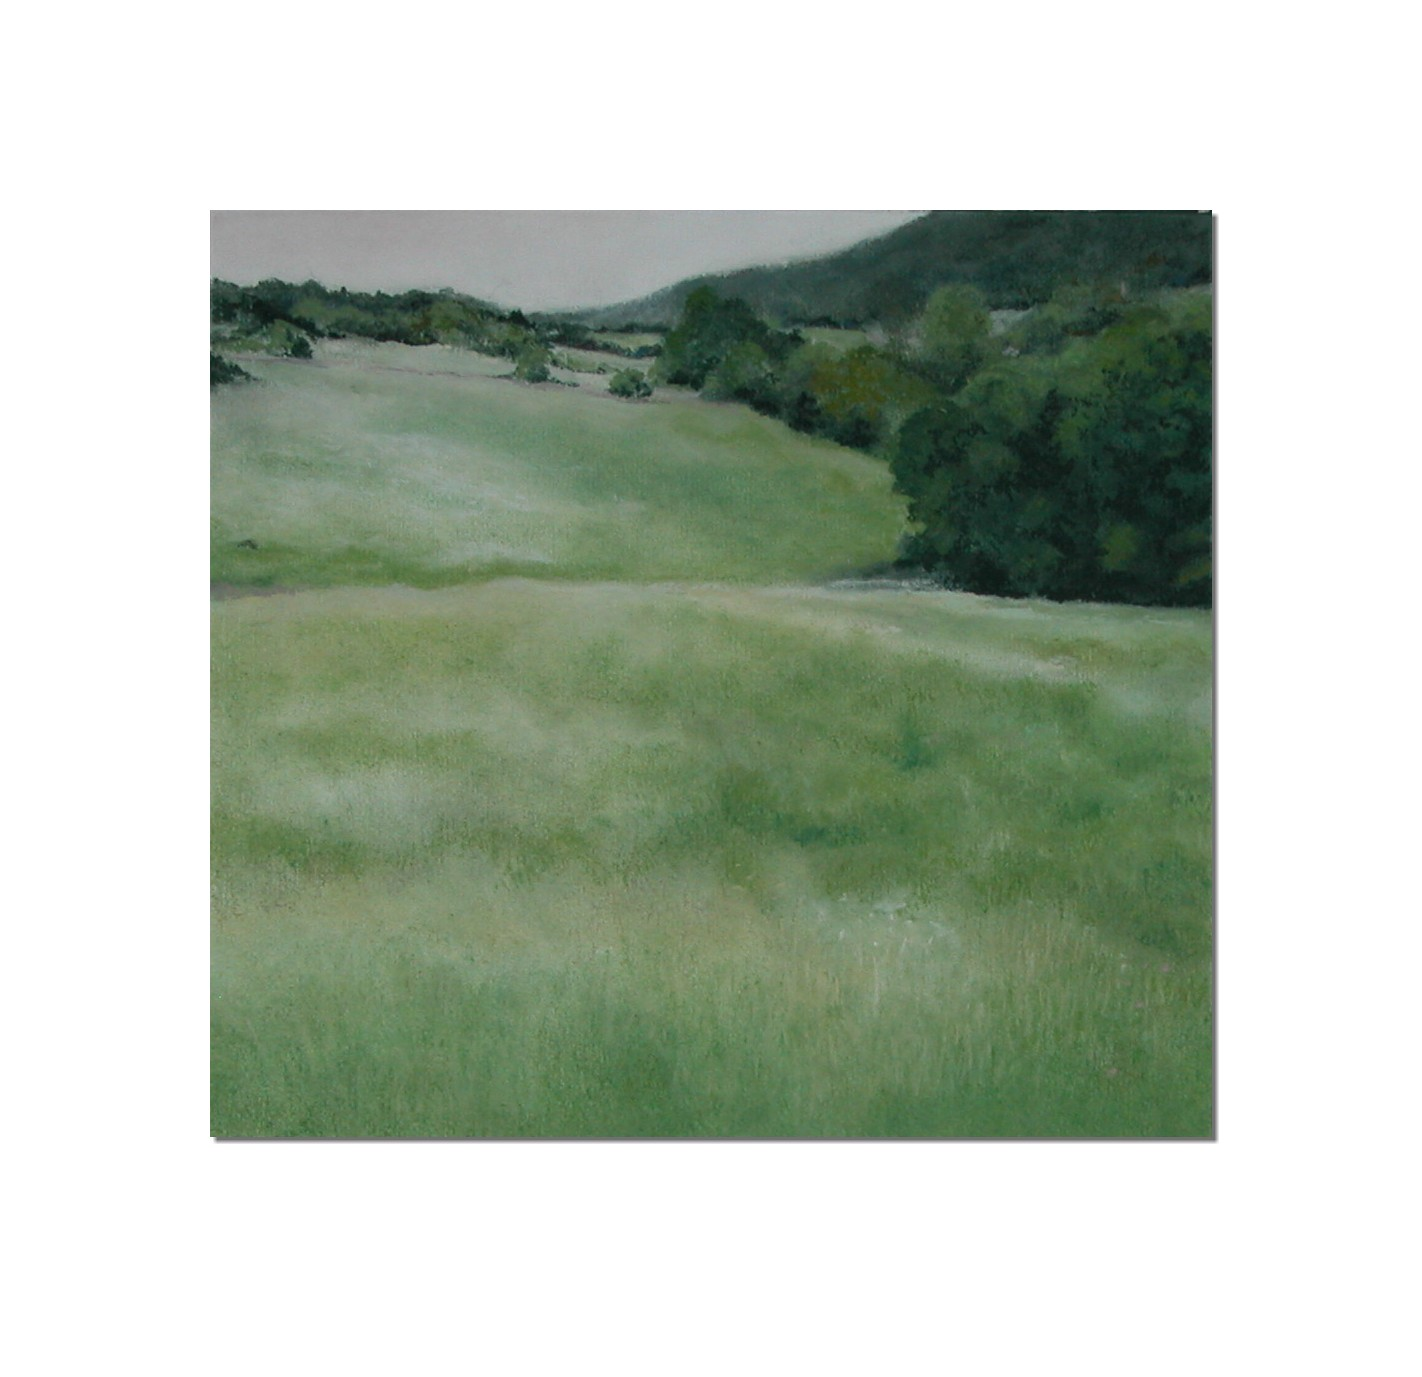 Grassland unframed 26 x 24 cm chalk pastel on paper £ 425